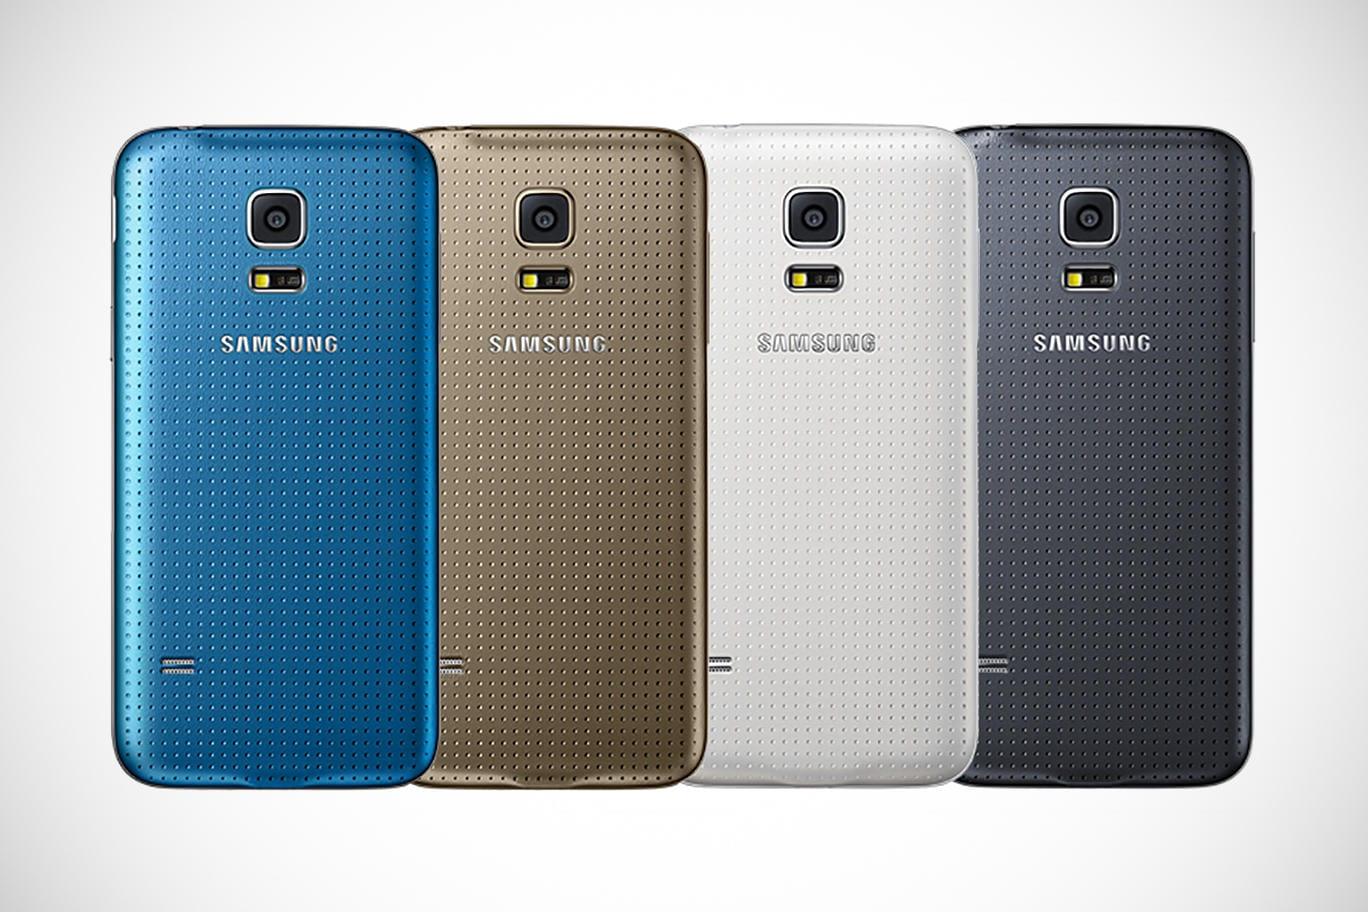 Samsung Galaxy S5 Mini (2)